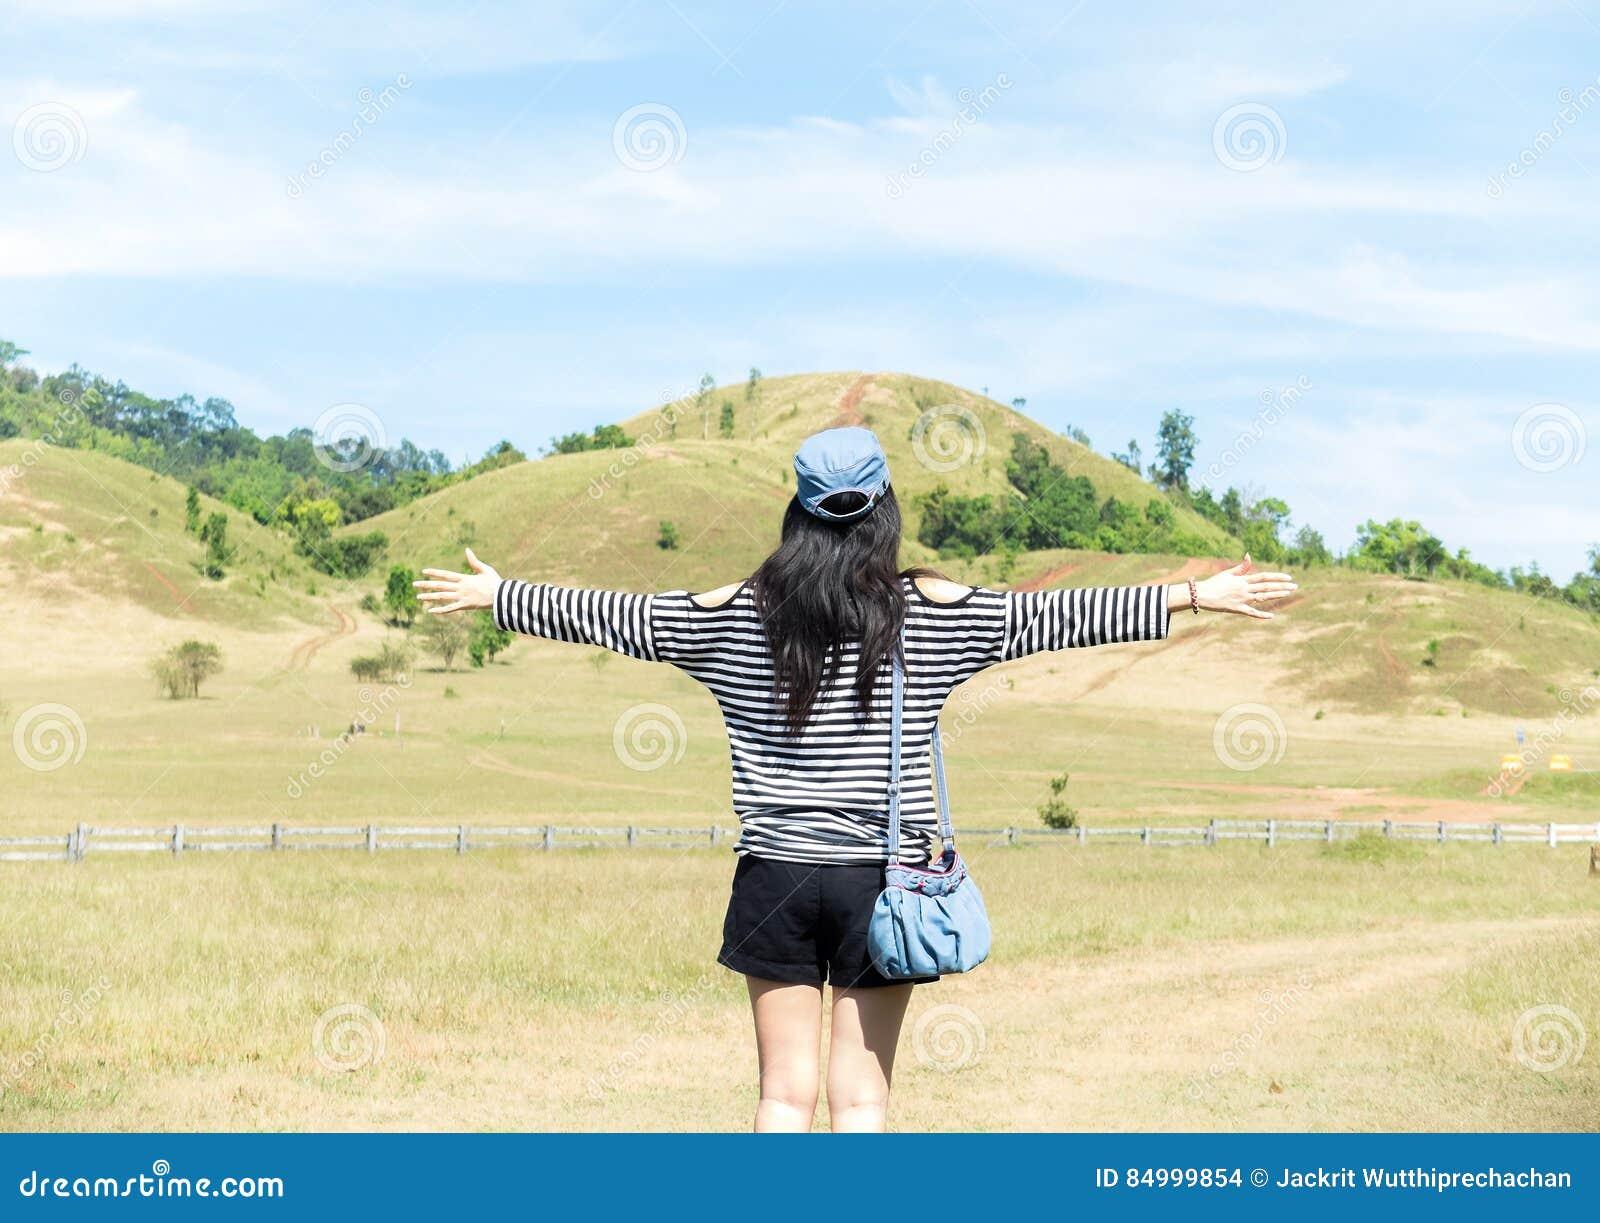 ea1c36fa2f Ευτυχής όμορφη ασιατική γυναίκα με το καπέλο και τσάντα έτοιμη να αρχίσει  τις διακοπές με τη φύση βουνών τοπίου στο υπόβαθρο Πηγαίνετε έννοια  ταξιδιού ...